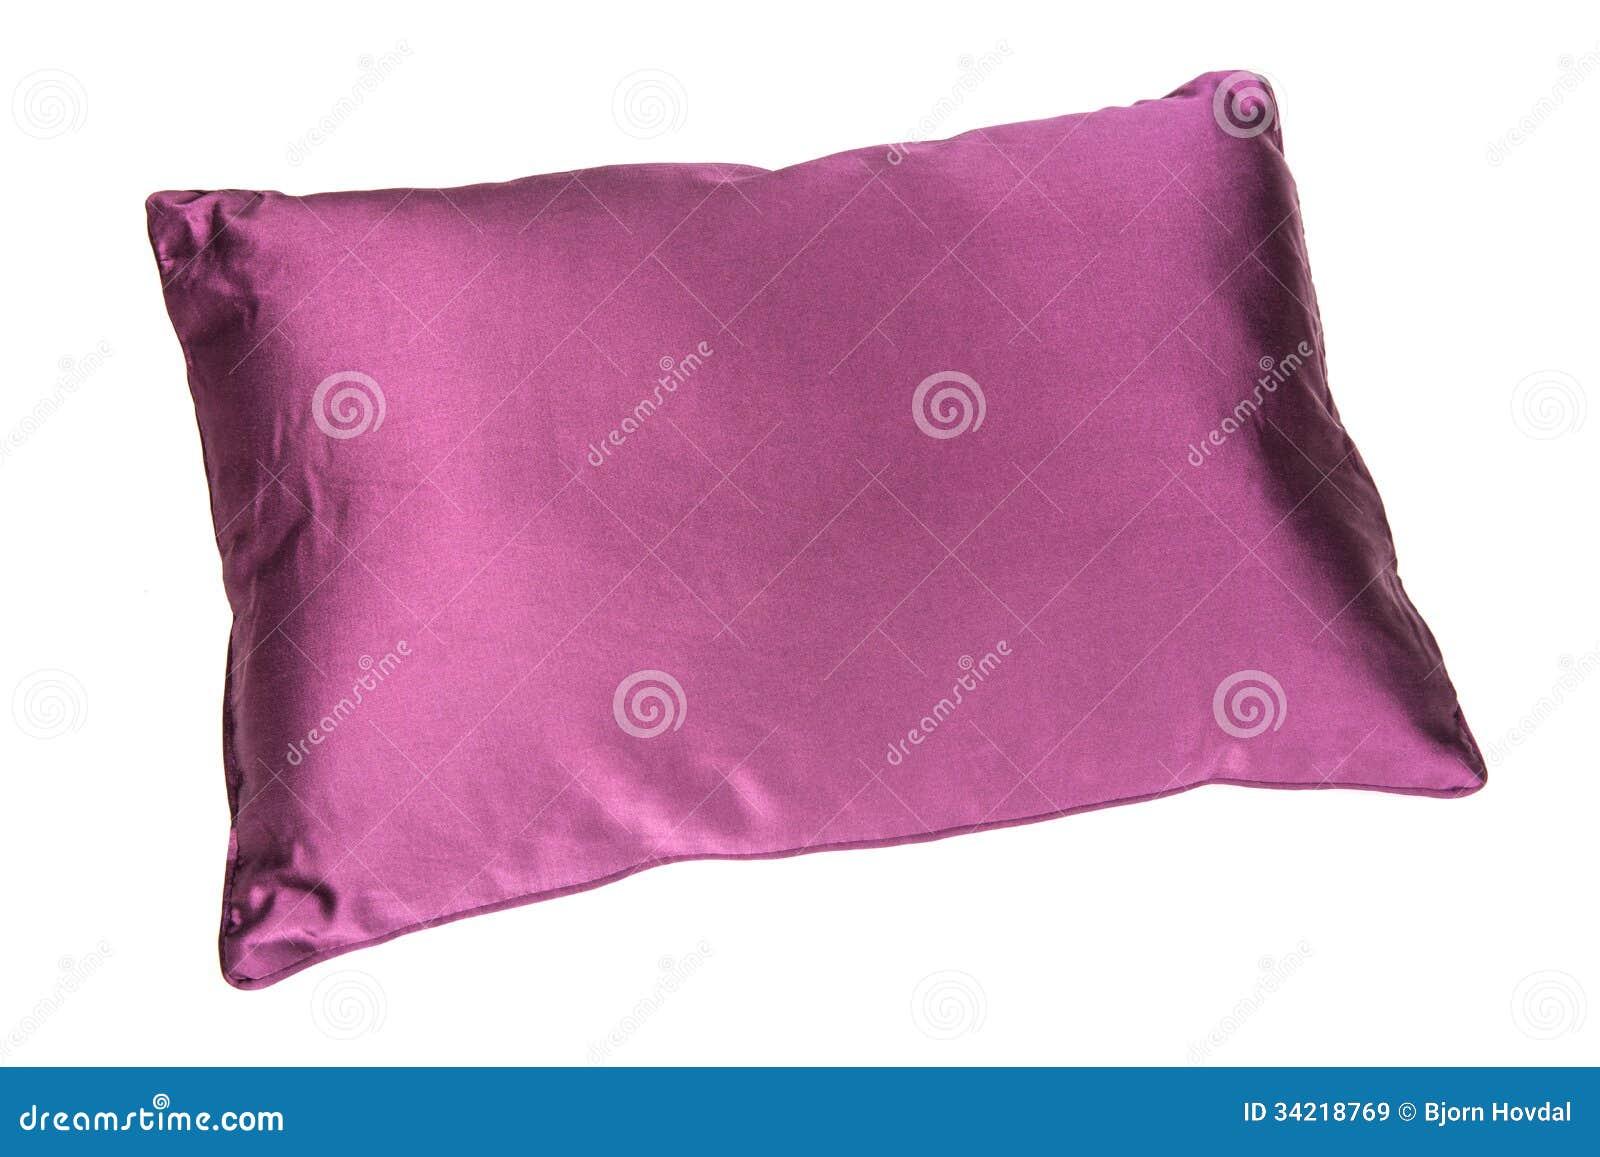 purple pillow stock image image of classic pillow comfort 34218769